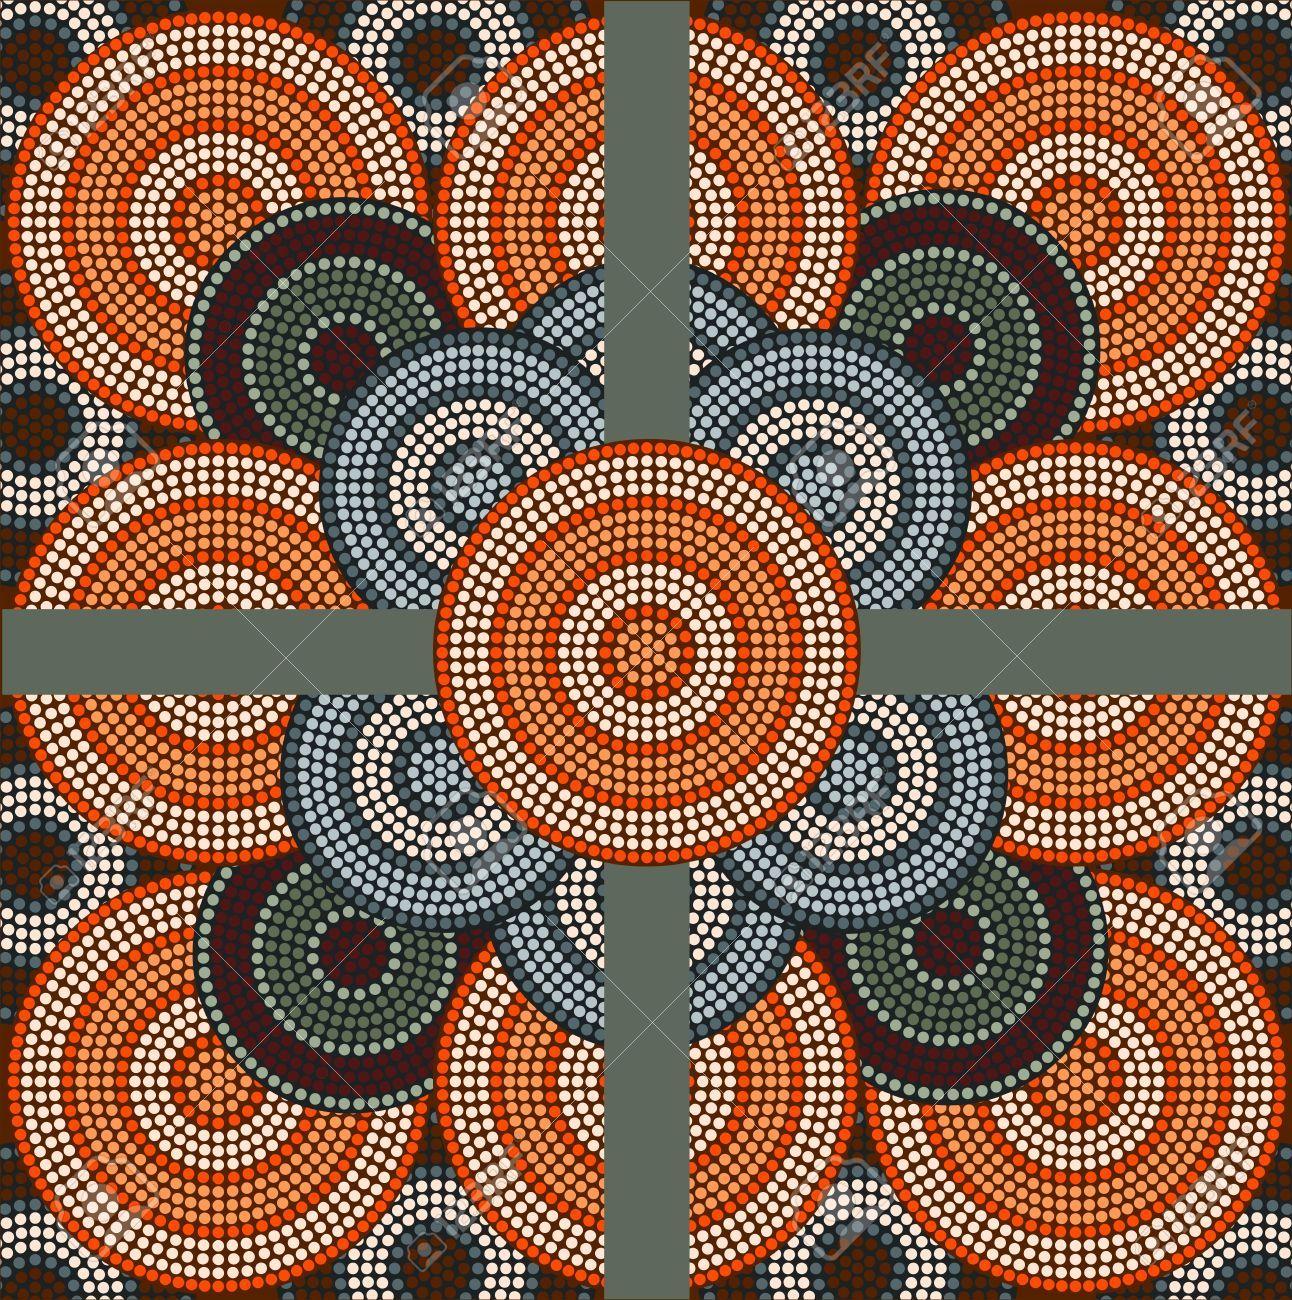 A Illustration Based On Aboriginal Style Of Dot